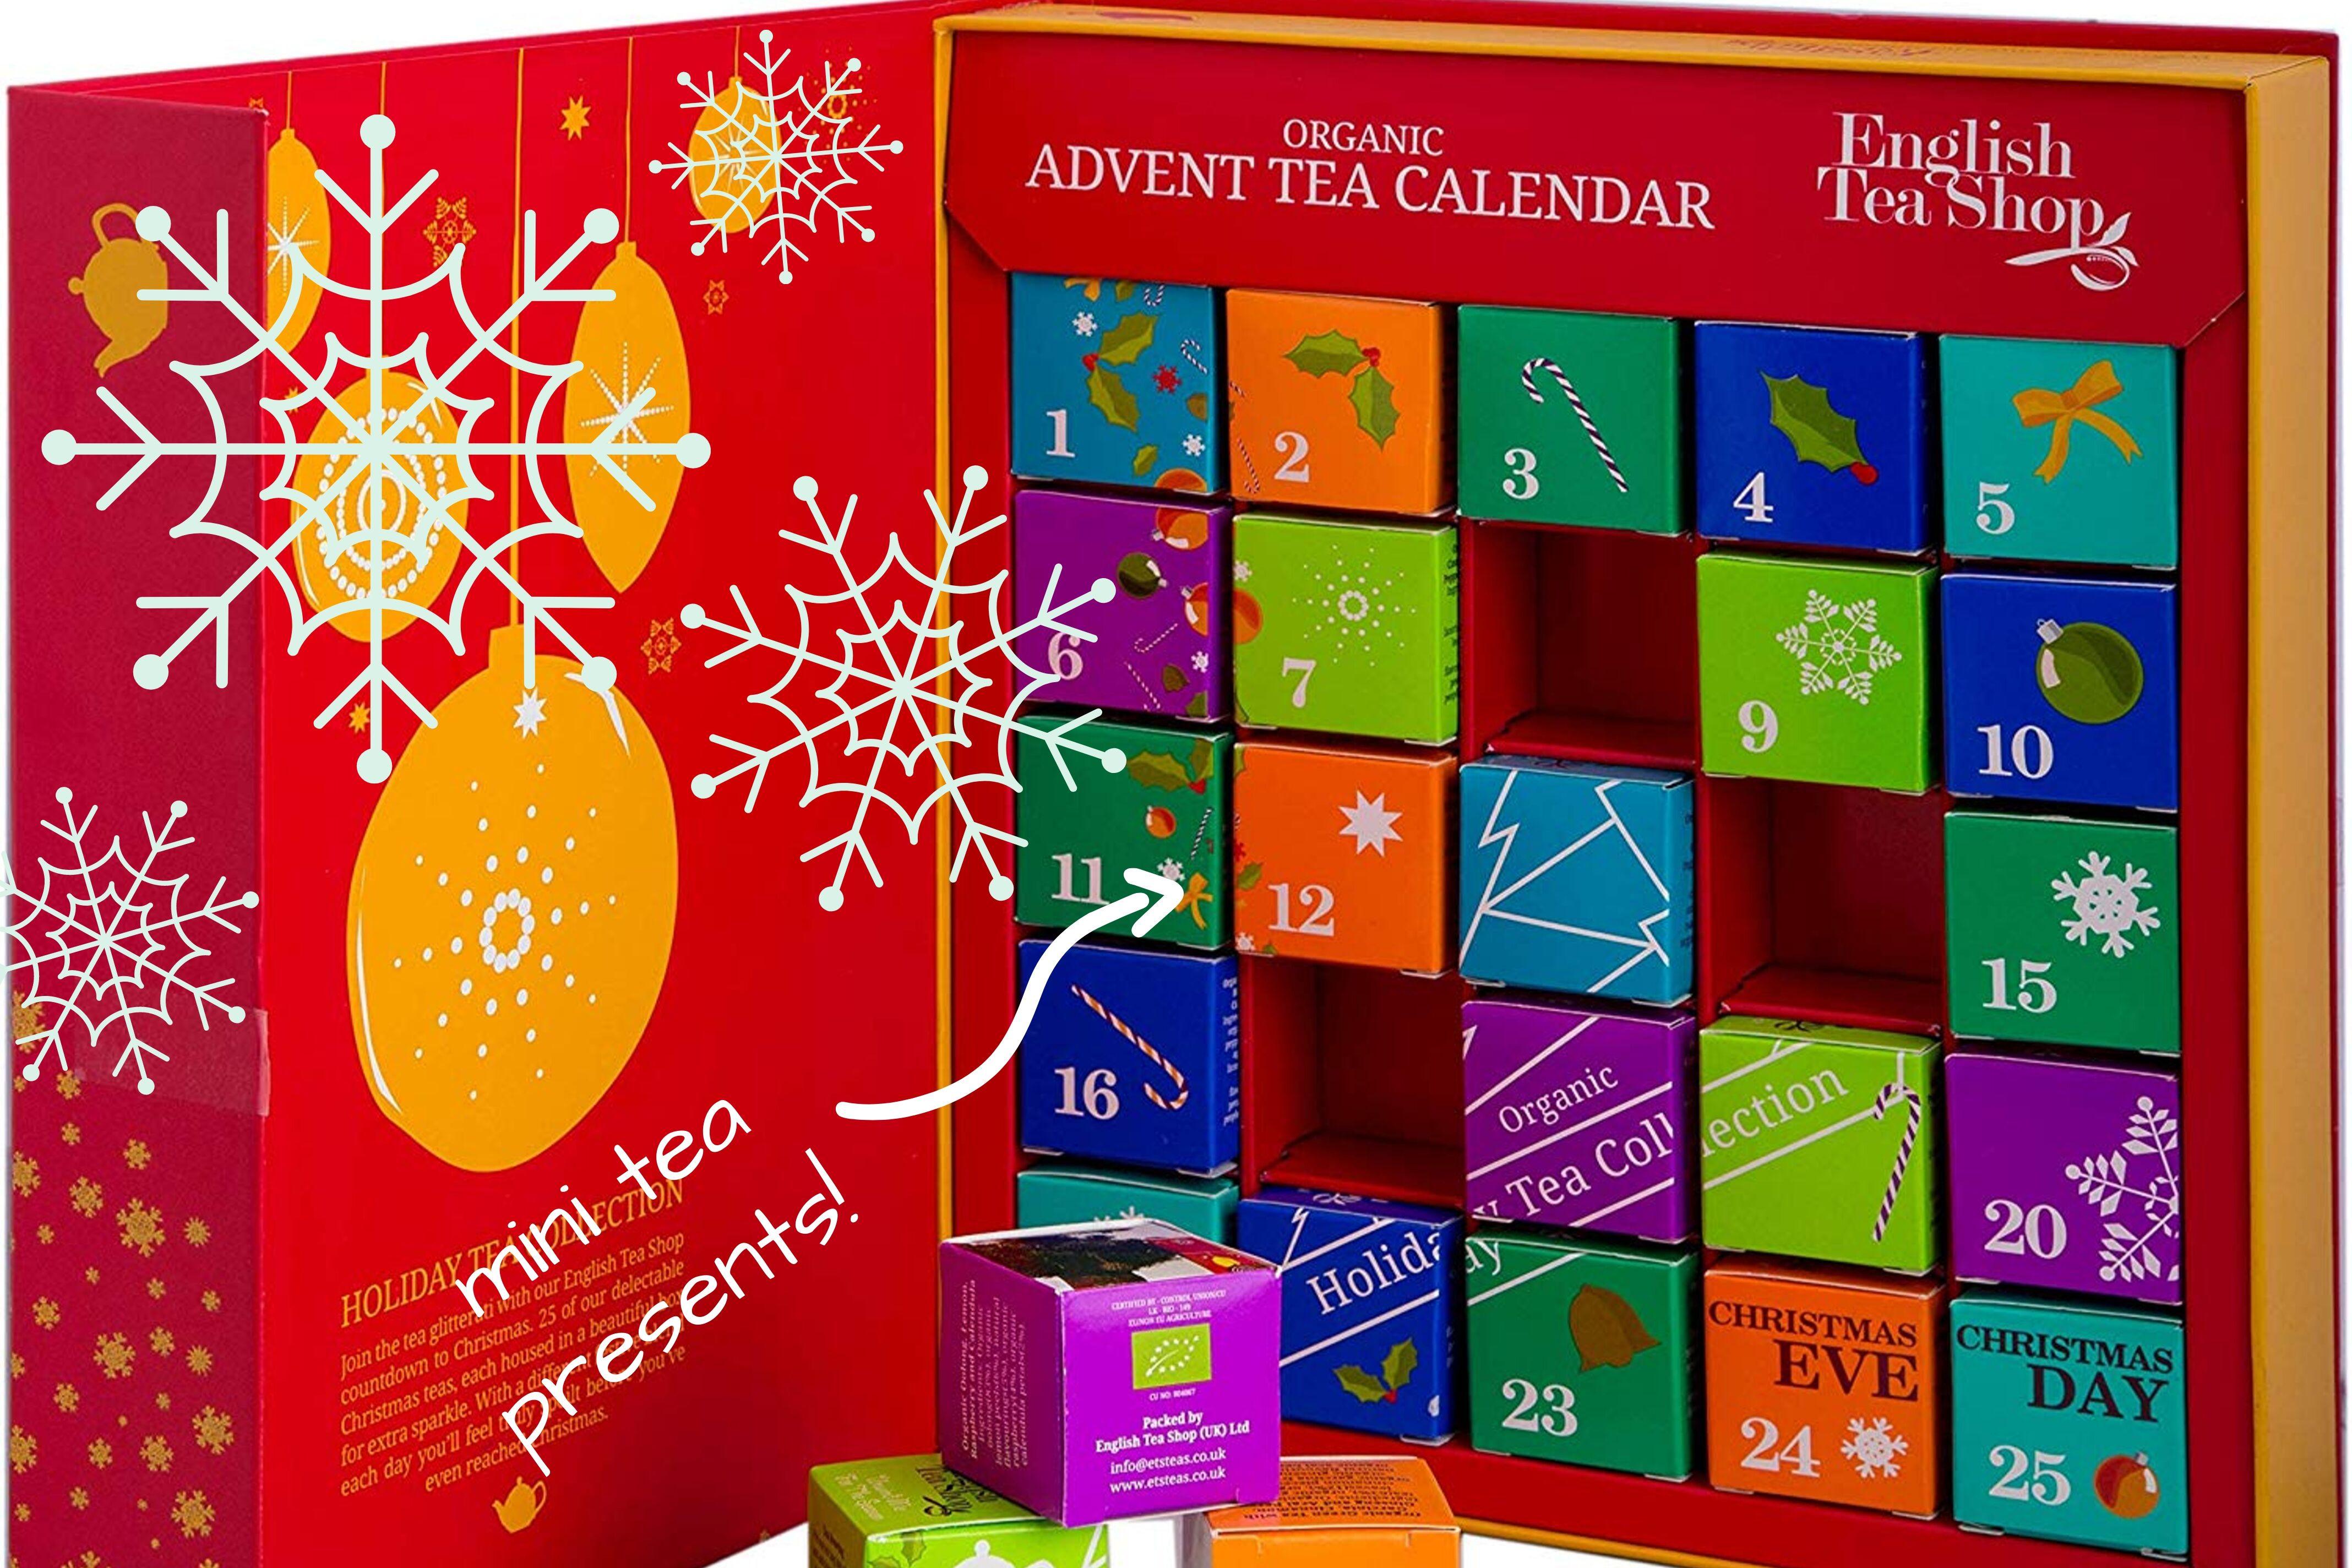 english tea shop red tea advent calendar